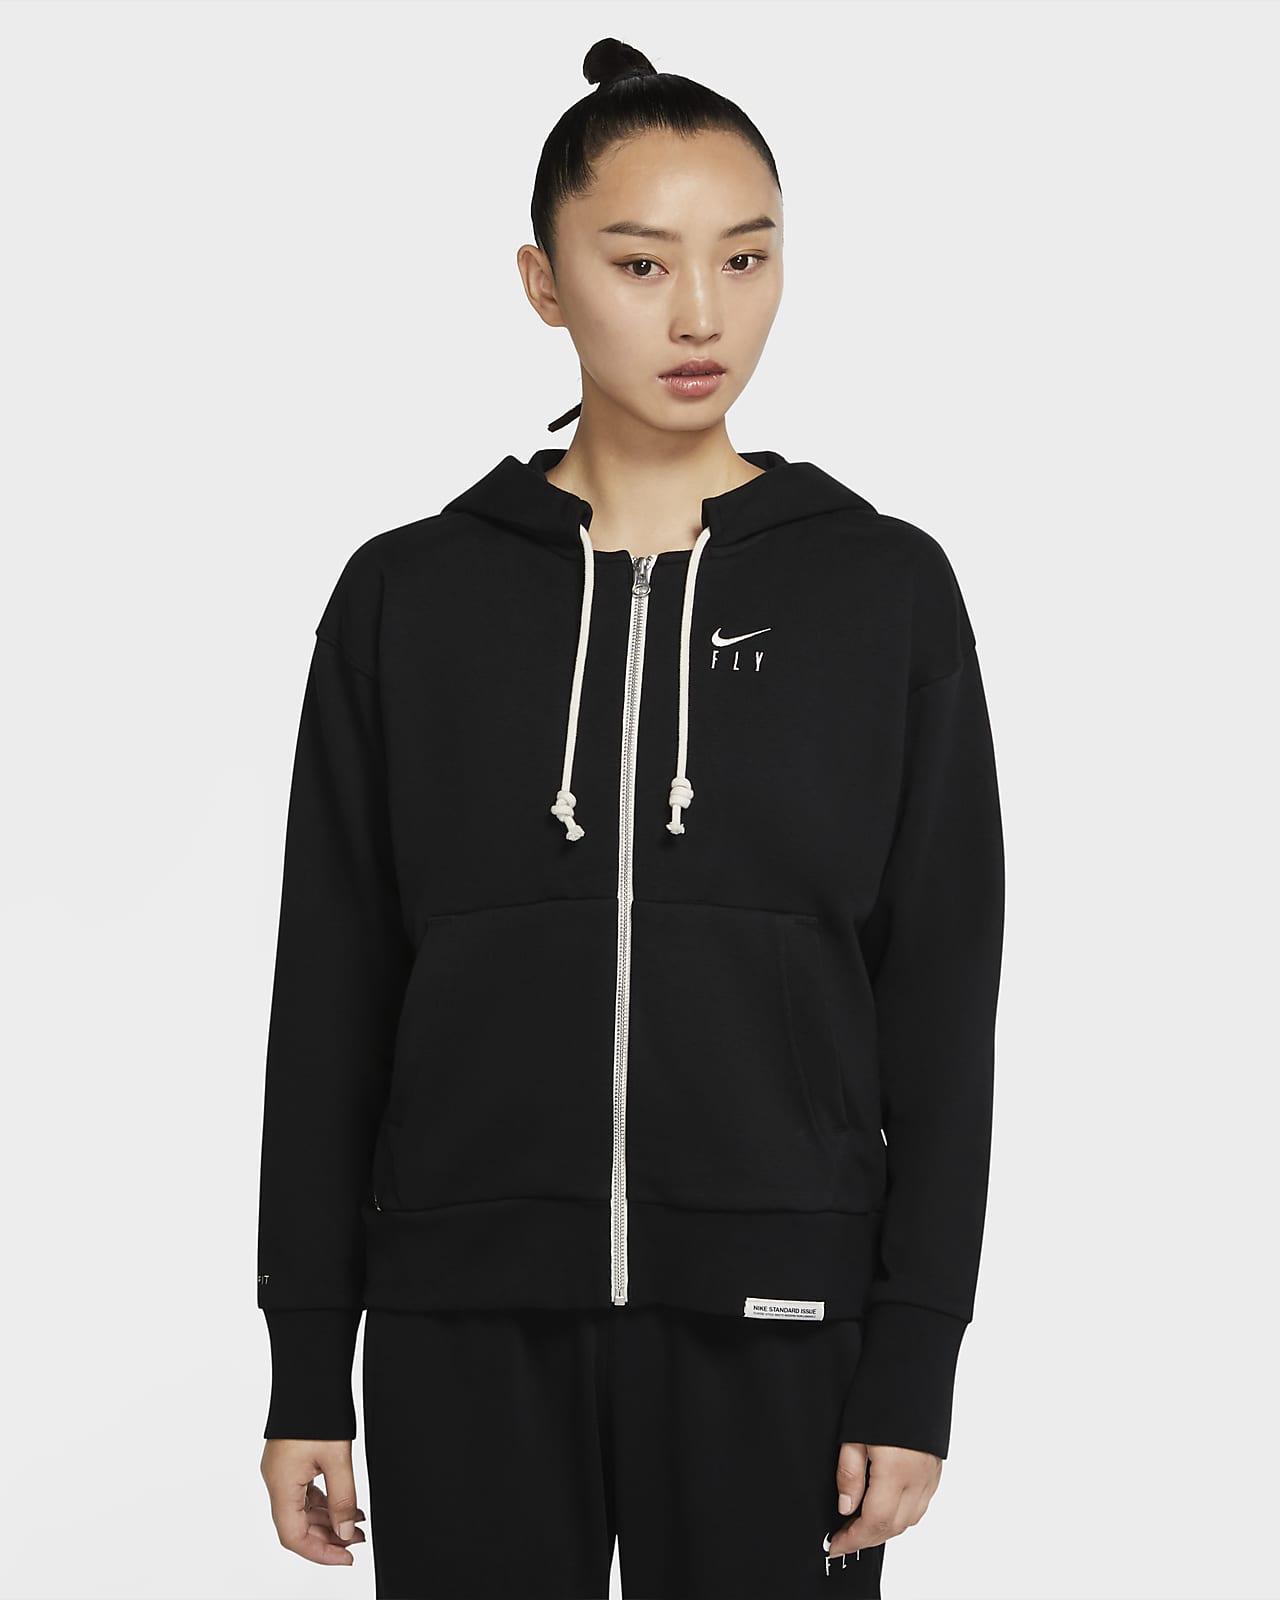 Nike Standard Issue 女子全长拉链开襟篮球连帽衫